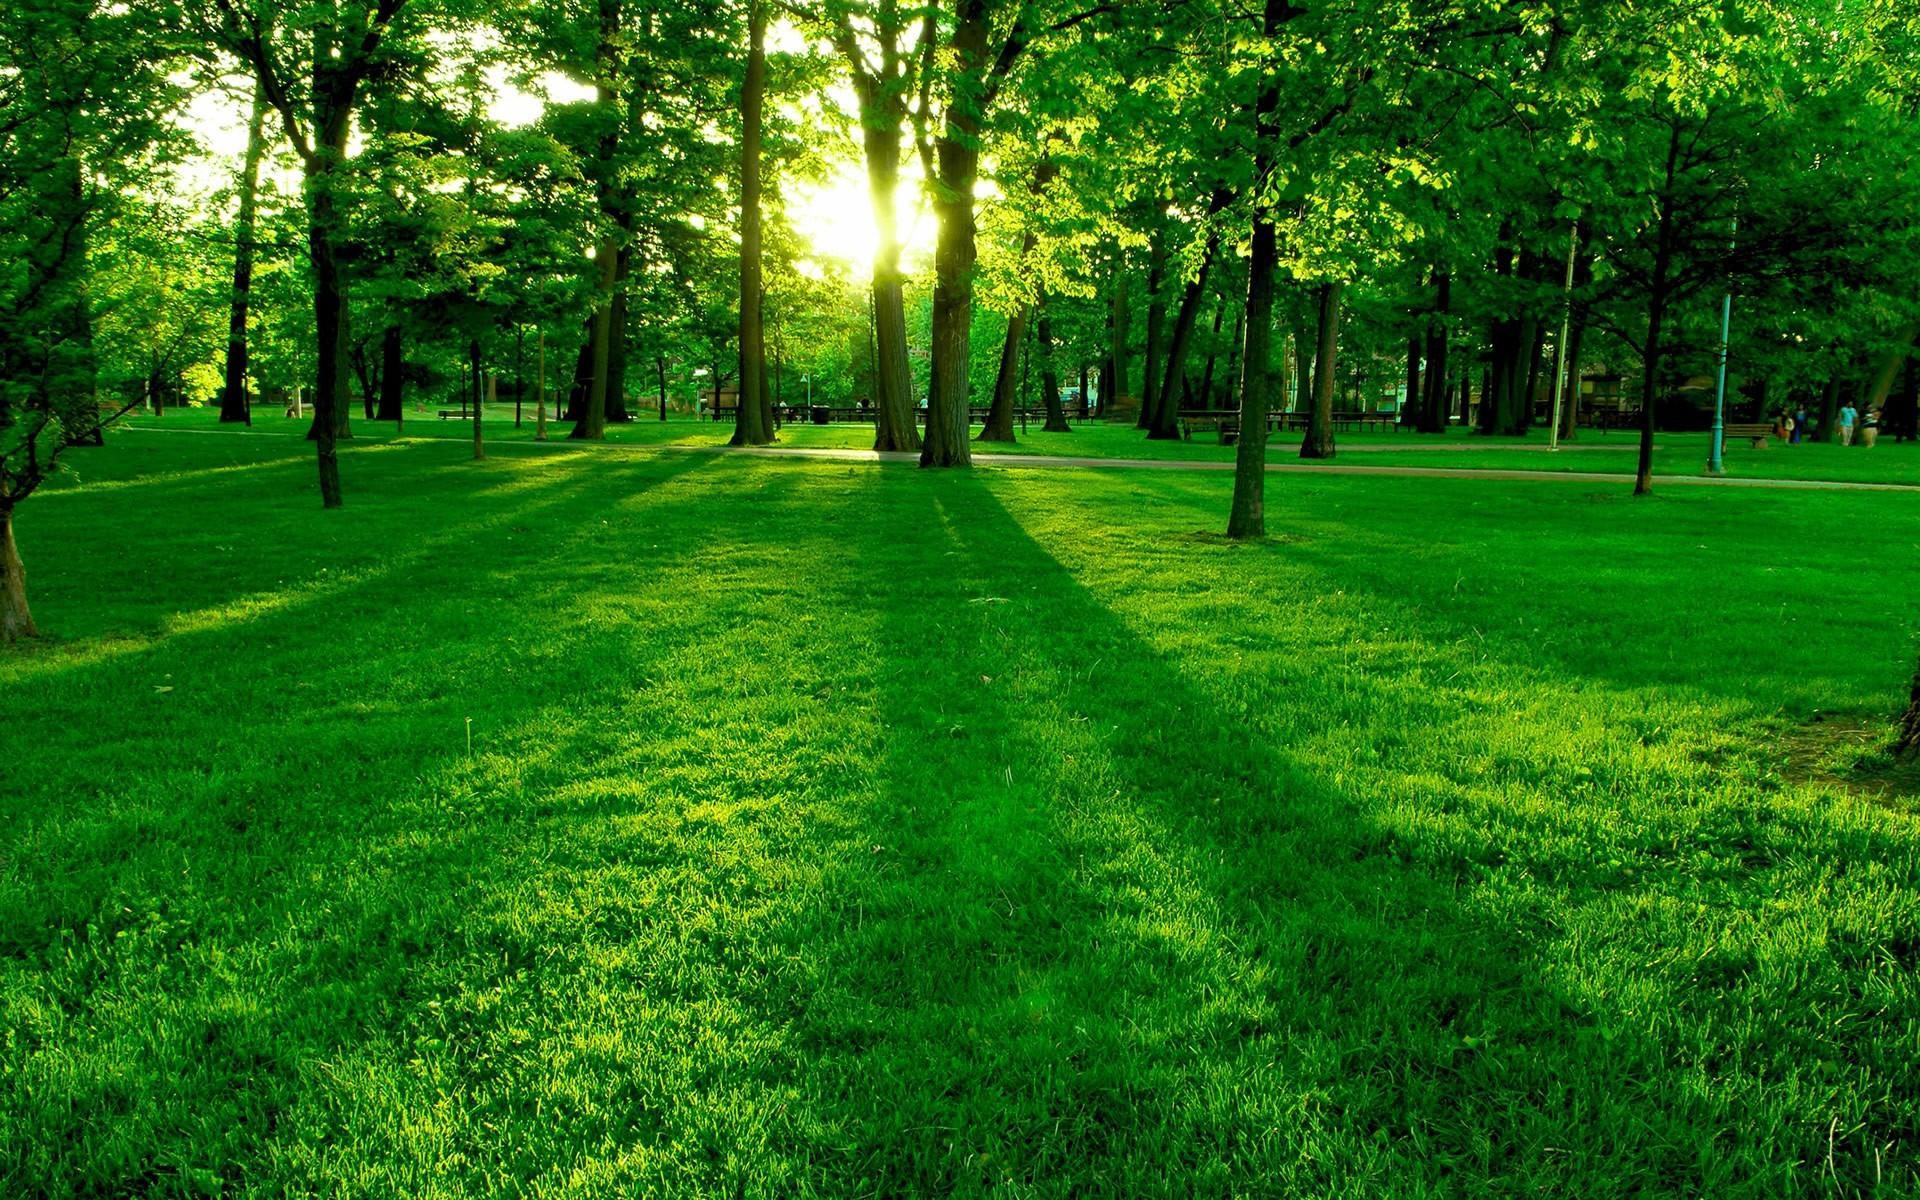 Nature Green Wallpaper Hd Iphone - HD Wallpaper